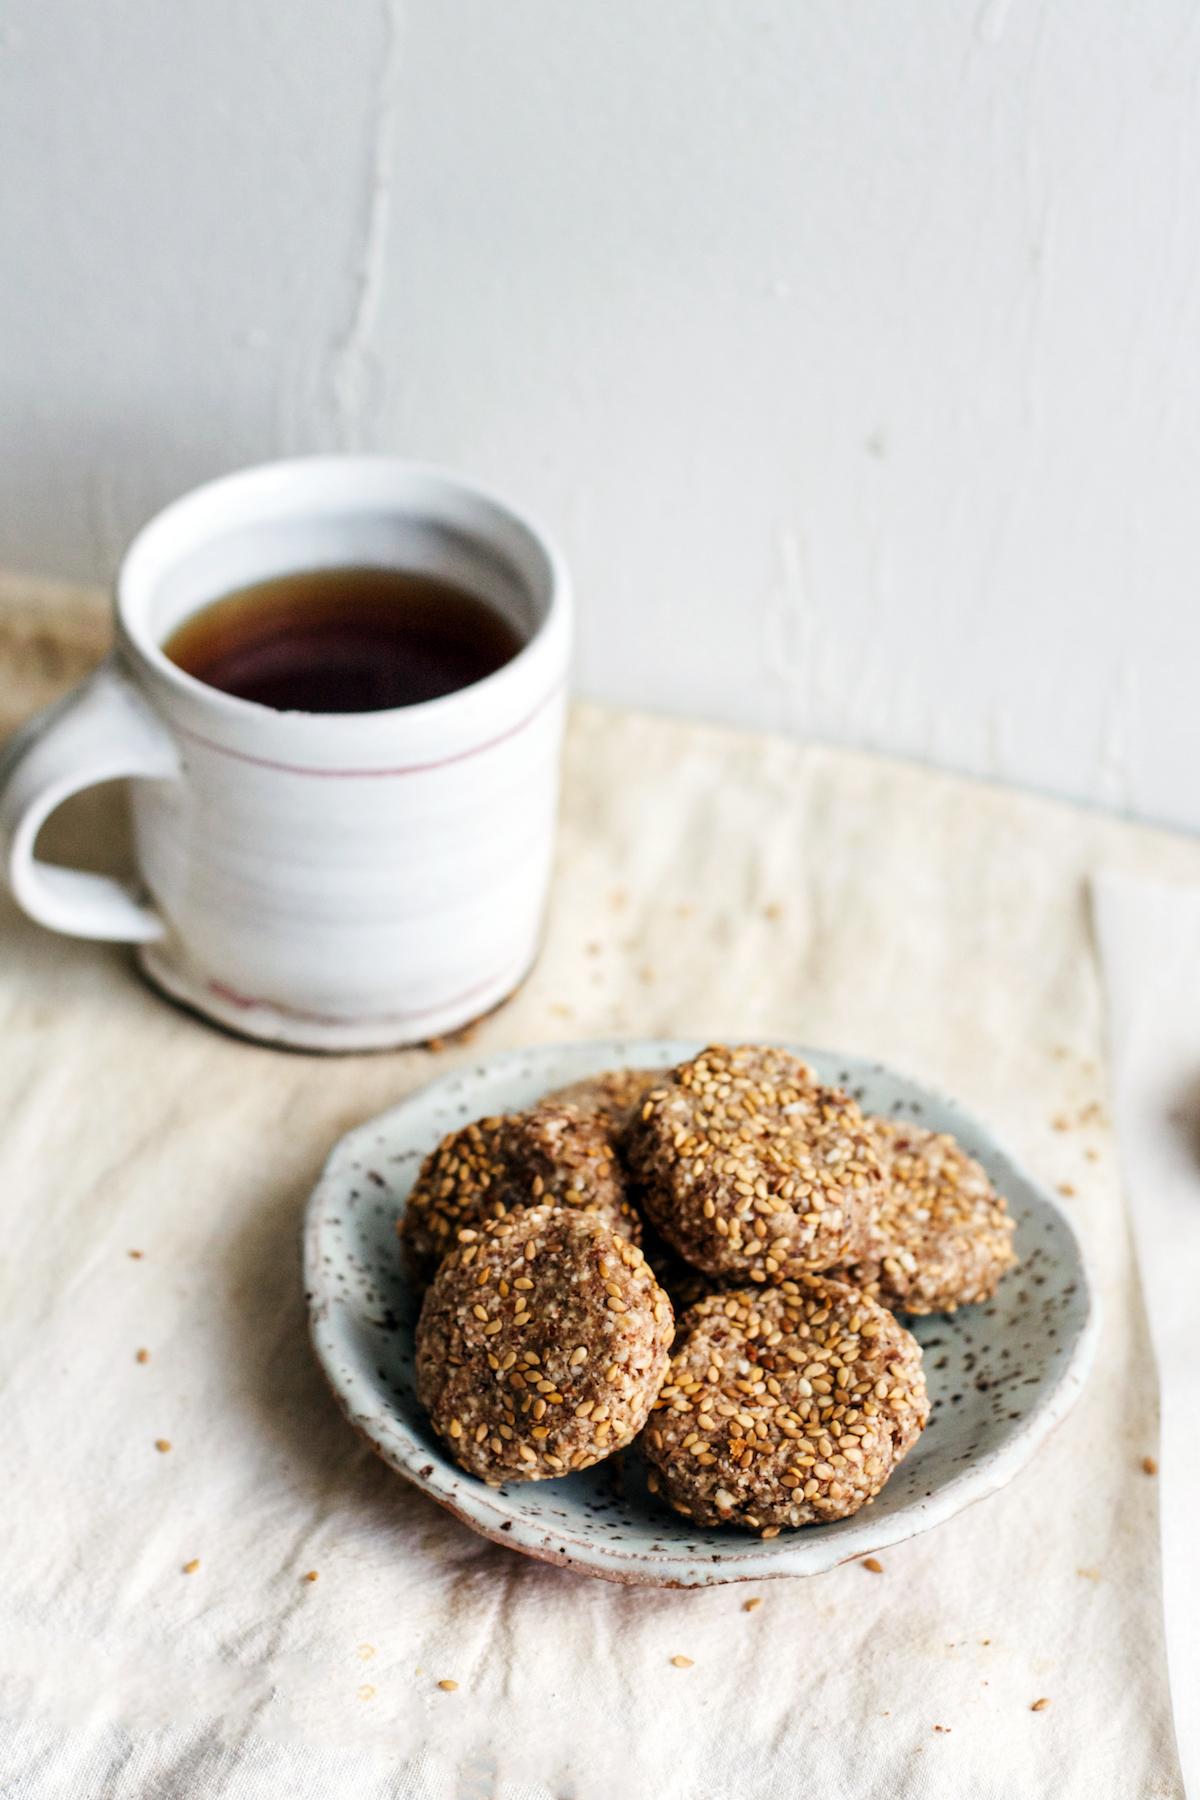 Spiced Sesame Date Cookies {refined sugar-free, gluten-free, vegan} | Ruby Josephine